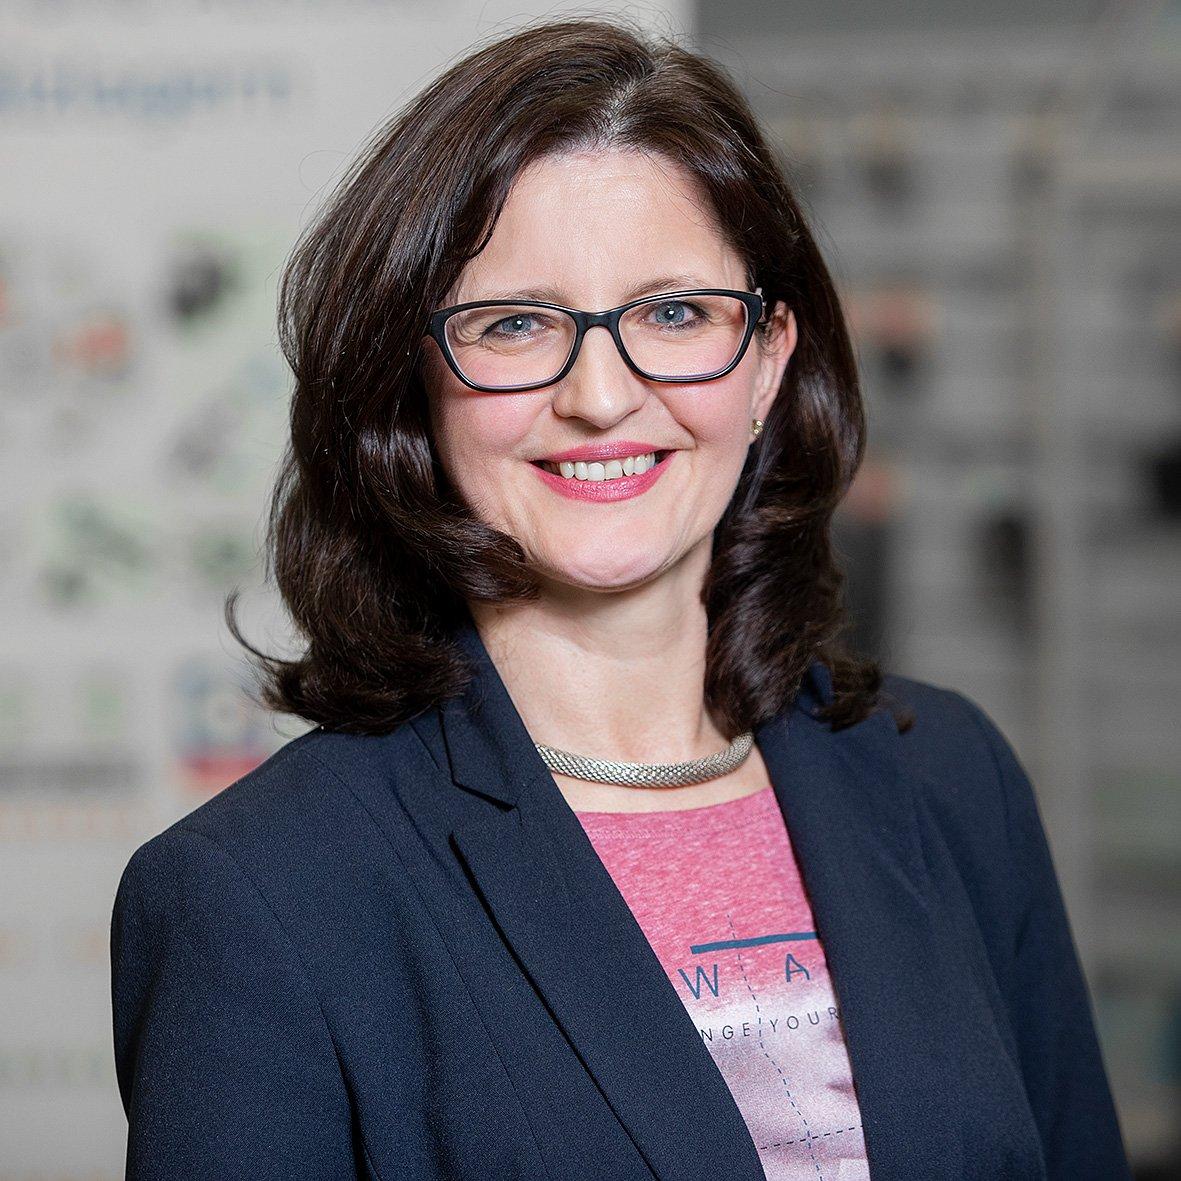 Ursula Willems Portrait